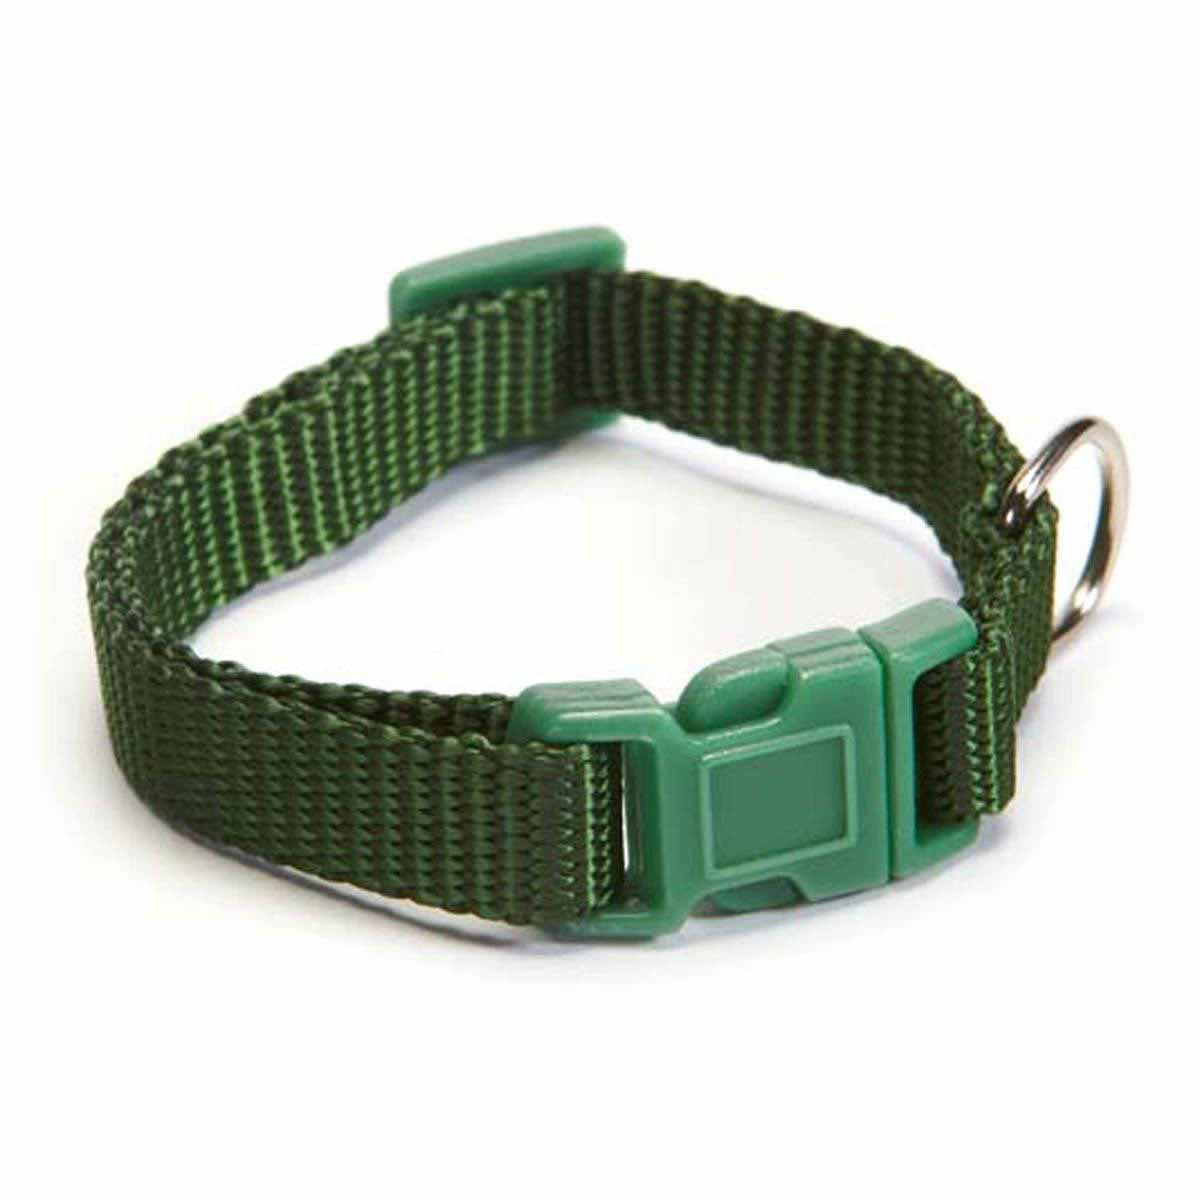 Zack Zoey Dog Collars